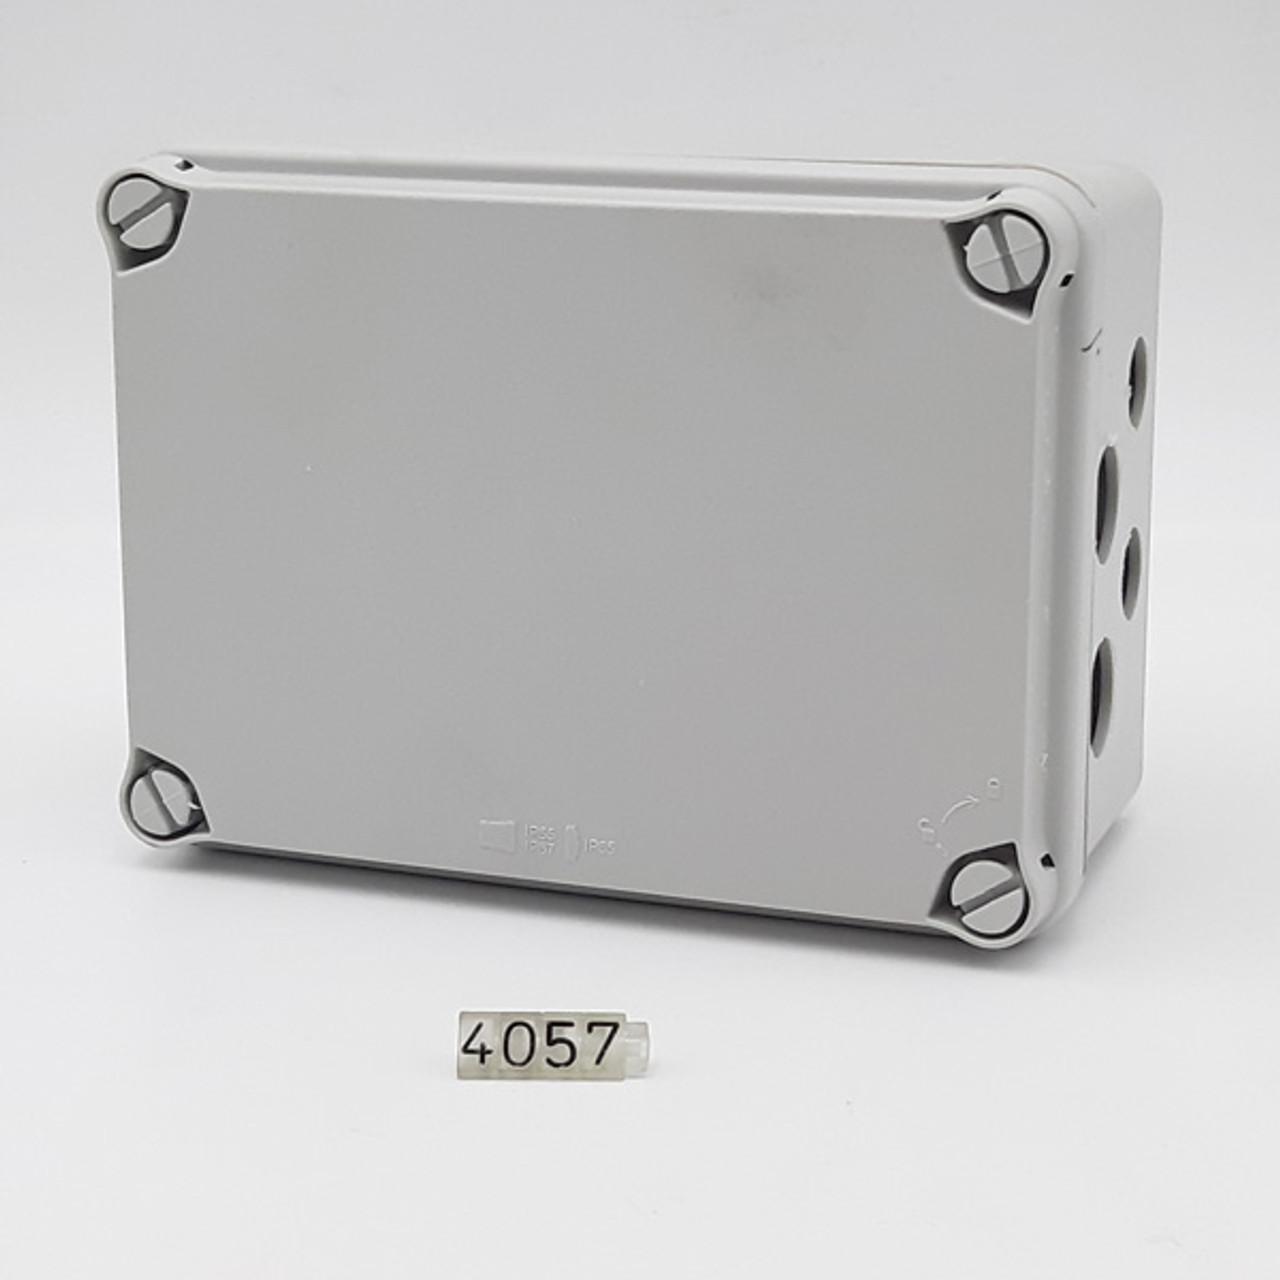 Talsa H-992 - H Series - Isolating Box - 4057